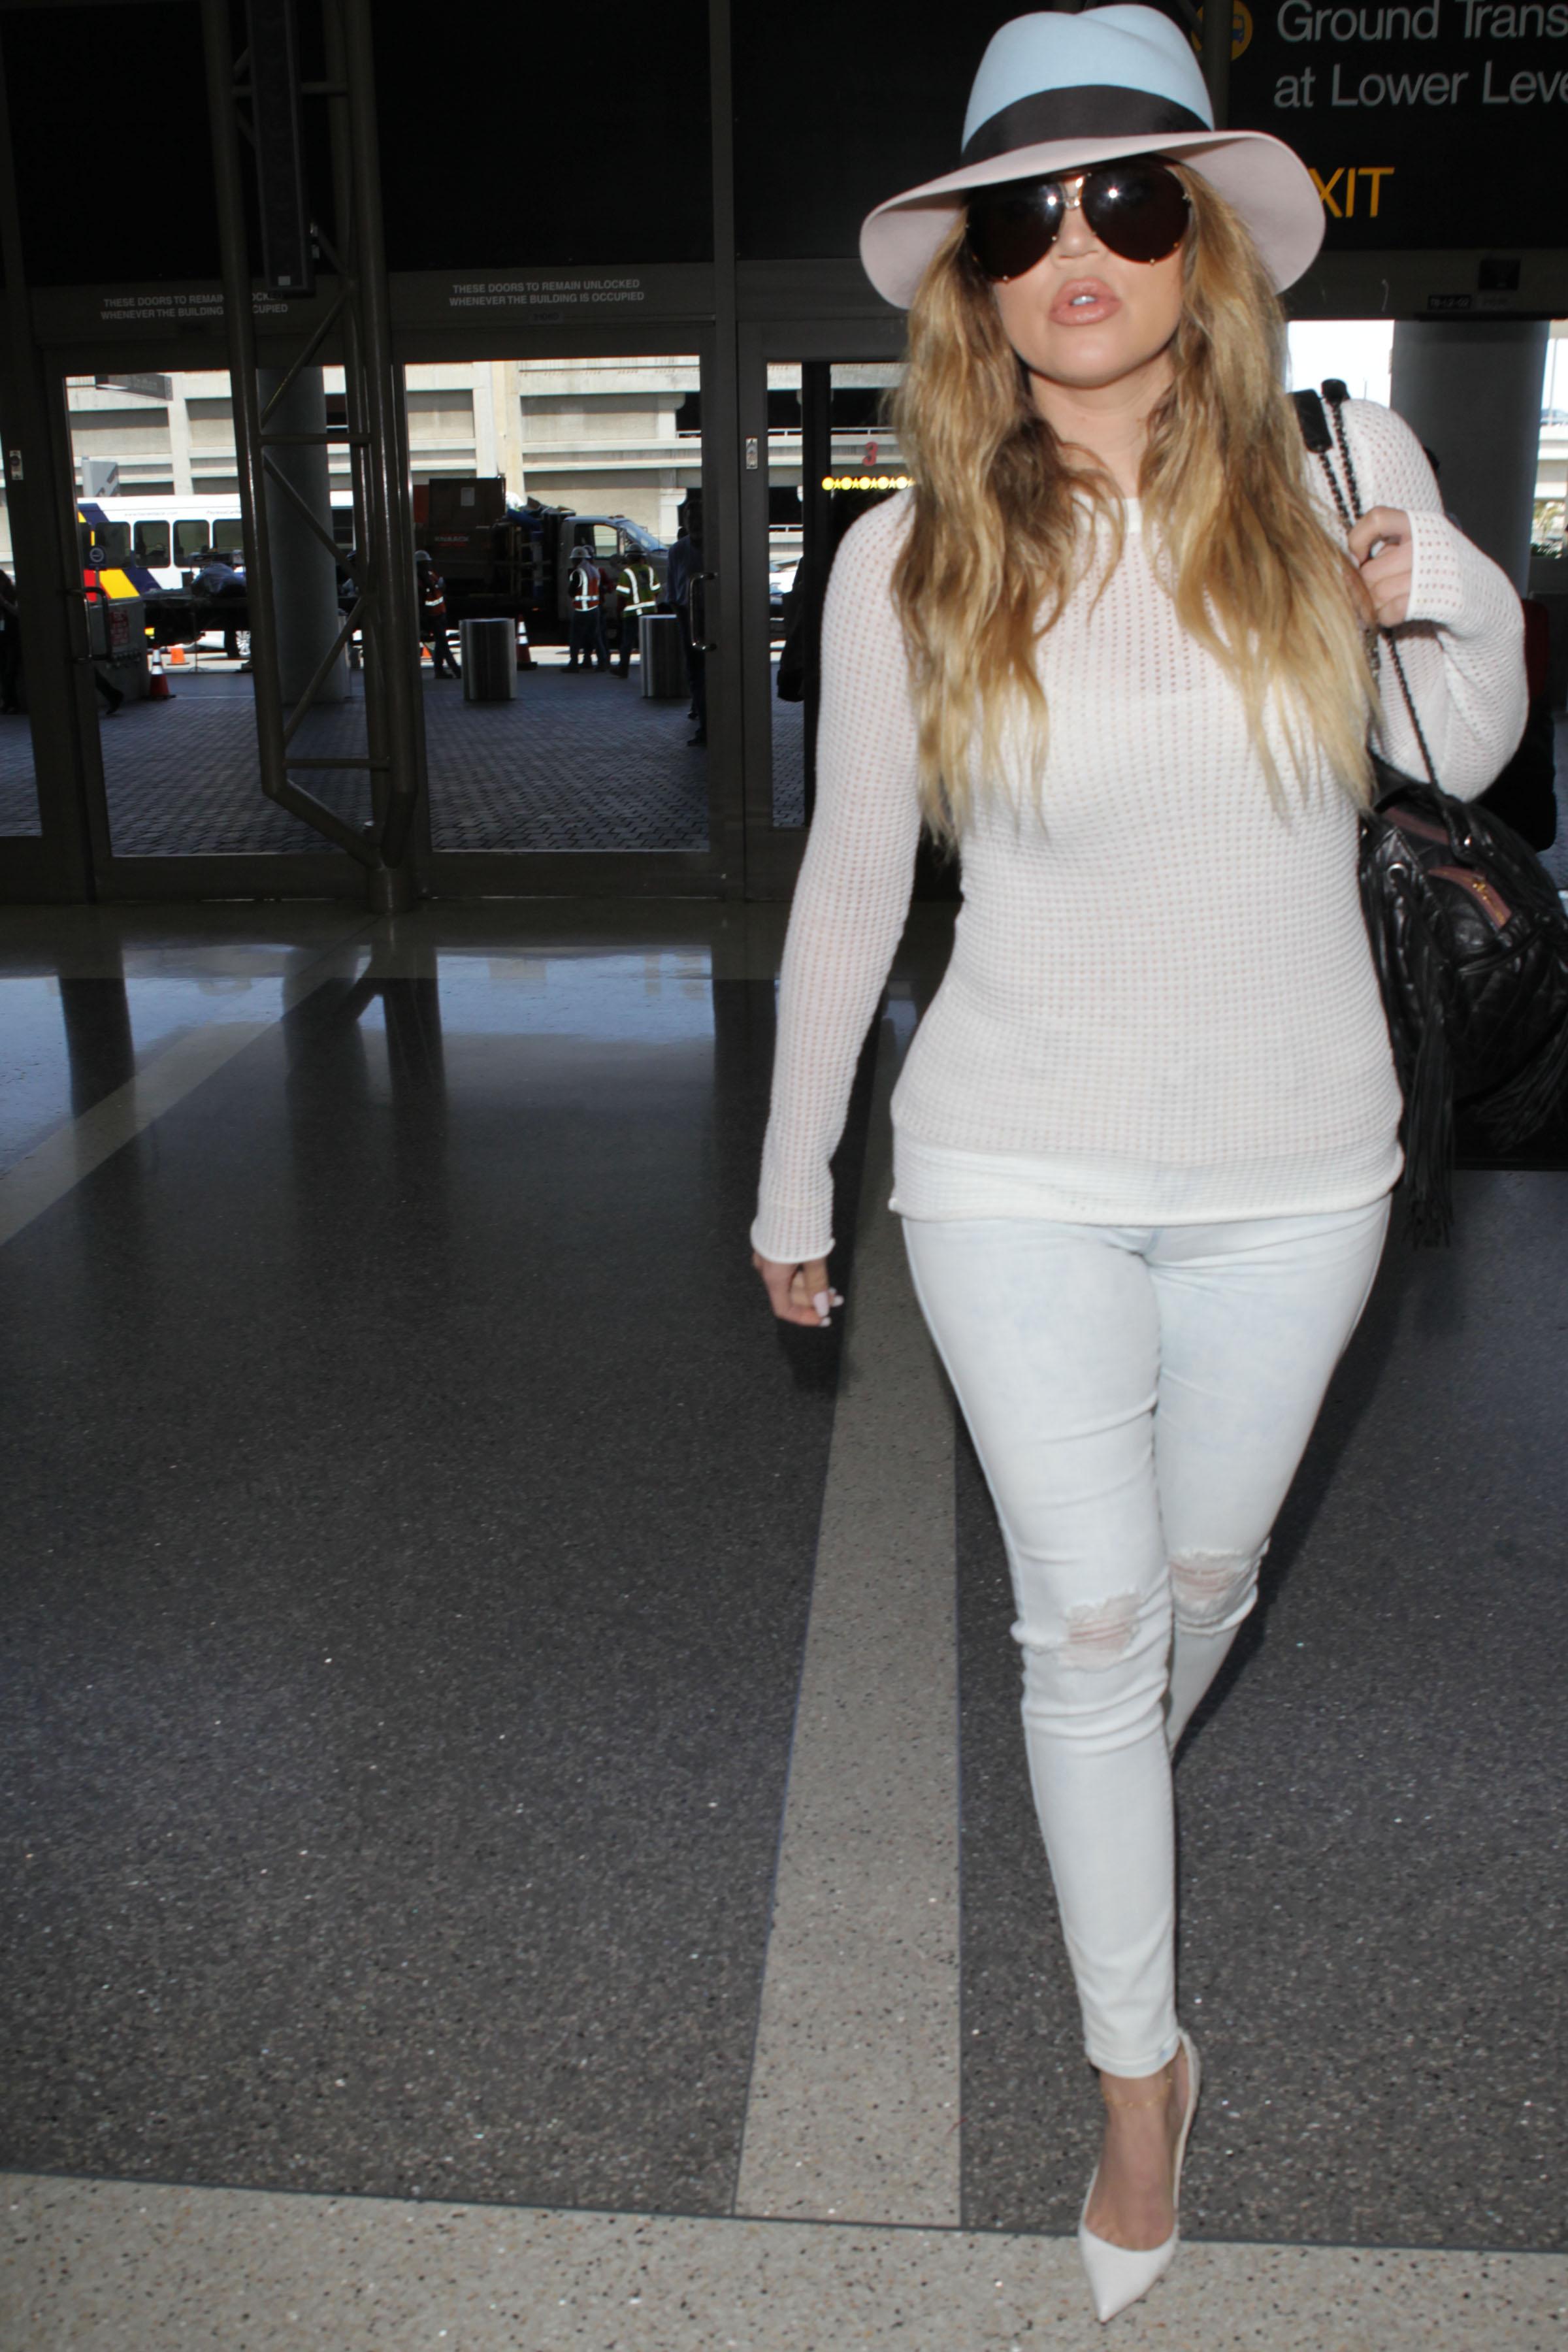 Khloe Kardashian leaves for Kim's wedding in Paris